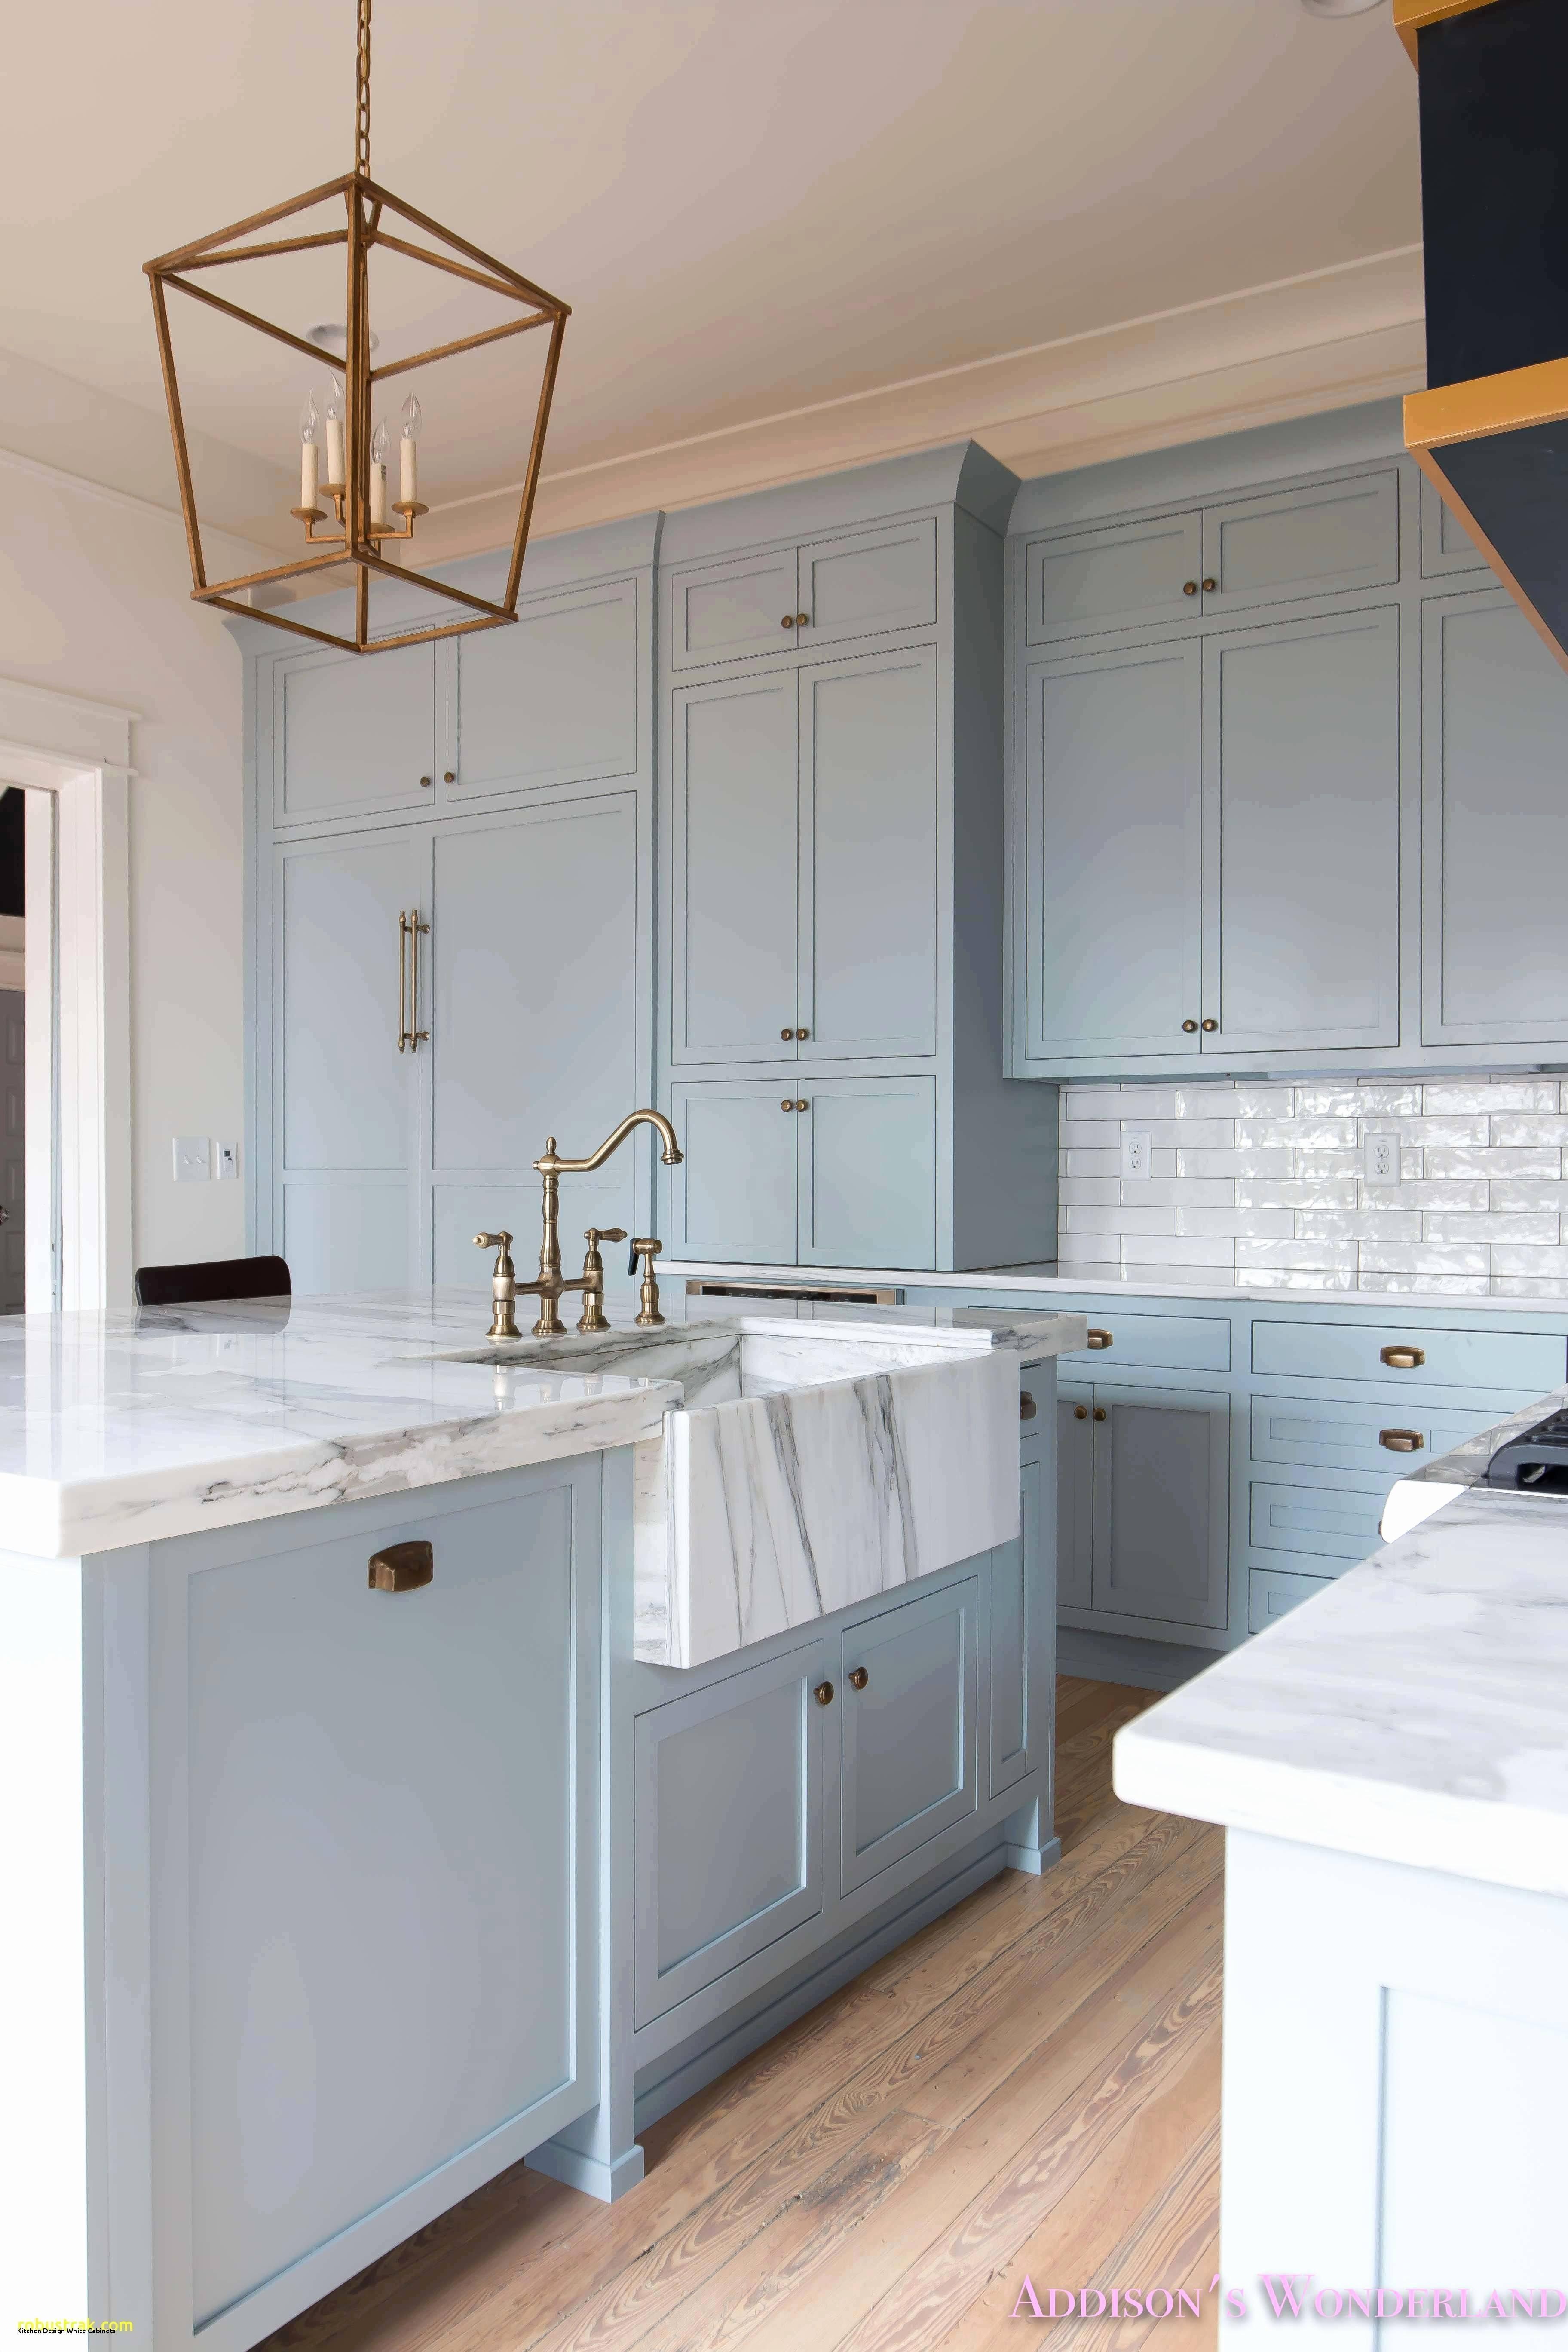 contemporary kitchen design small inspirational modern kitchen decor ideas 1960s 0d design white cabinets baneproject of contemporary kitchen design small